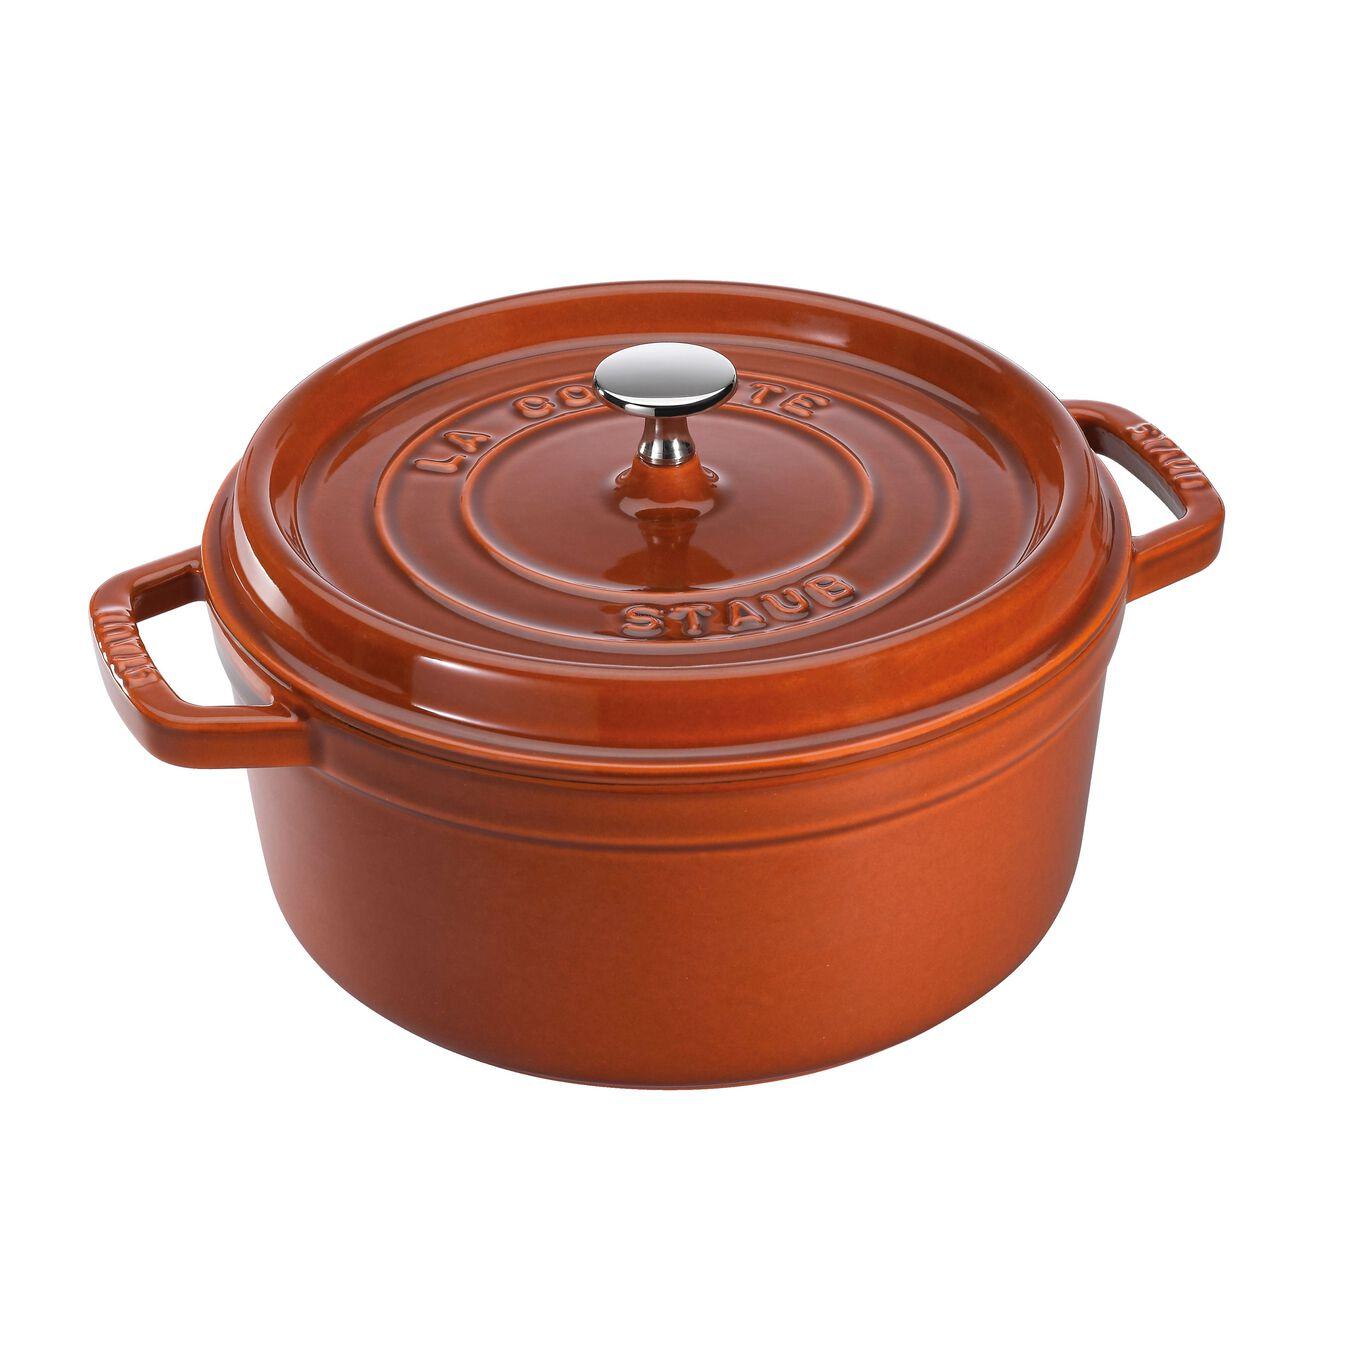 2.75-qt Round Cocotte - Burnt Orange,,large 1